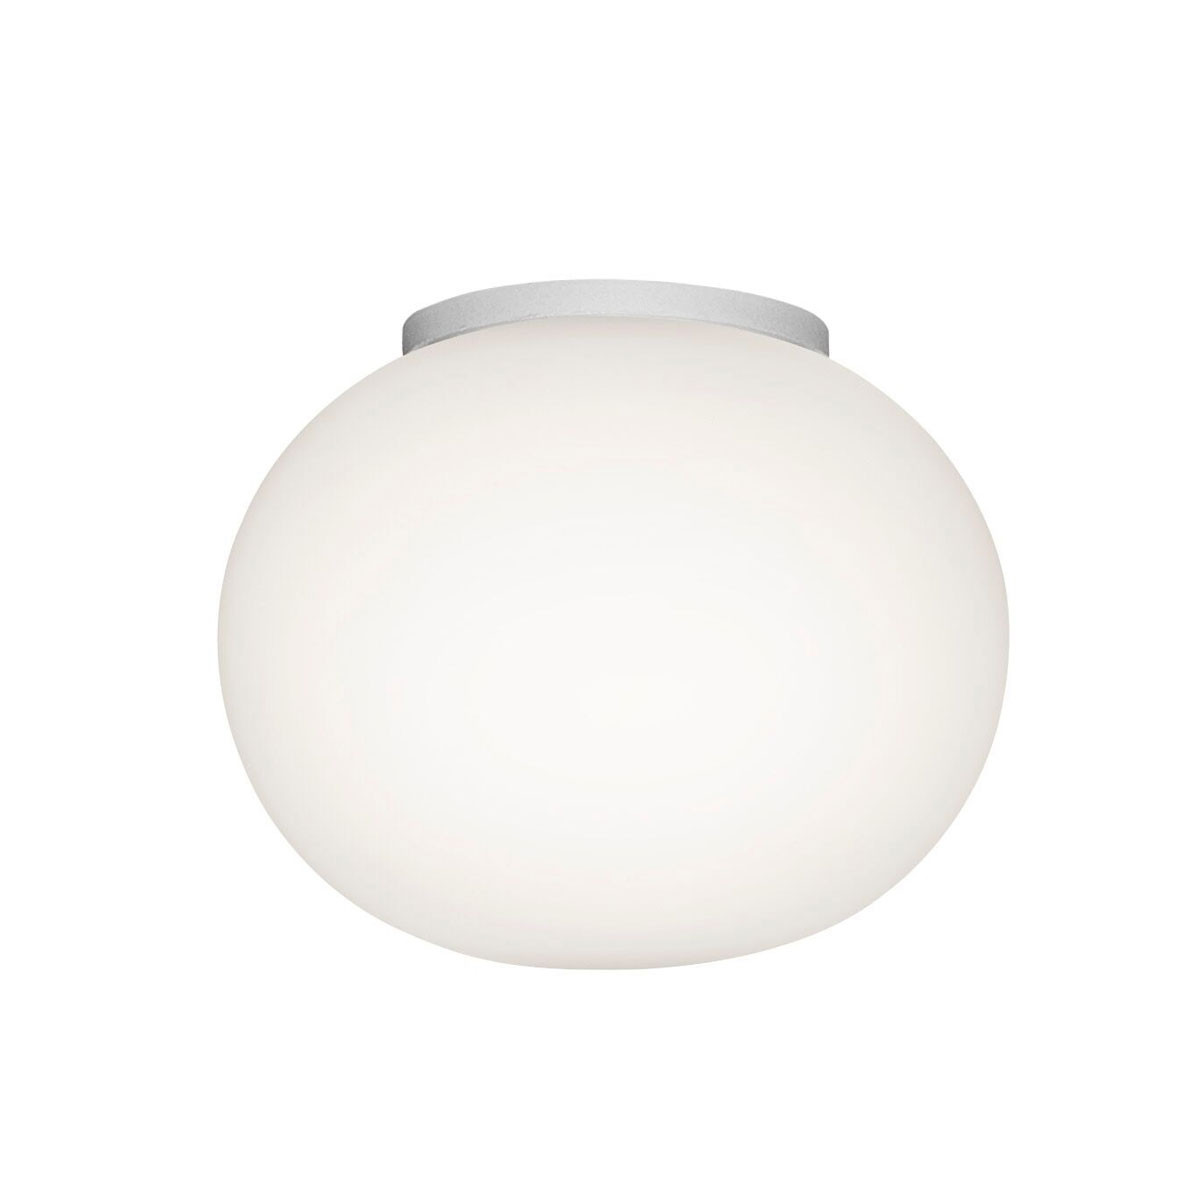 Flos Glo-Ball Ceiling/Wall Light